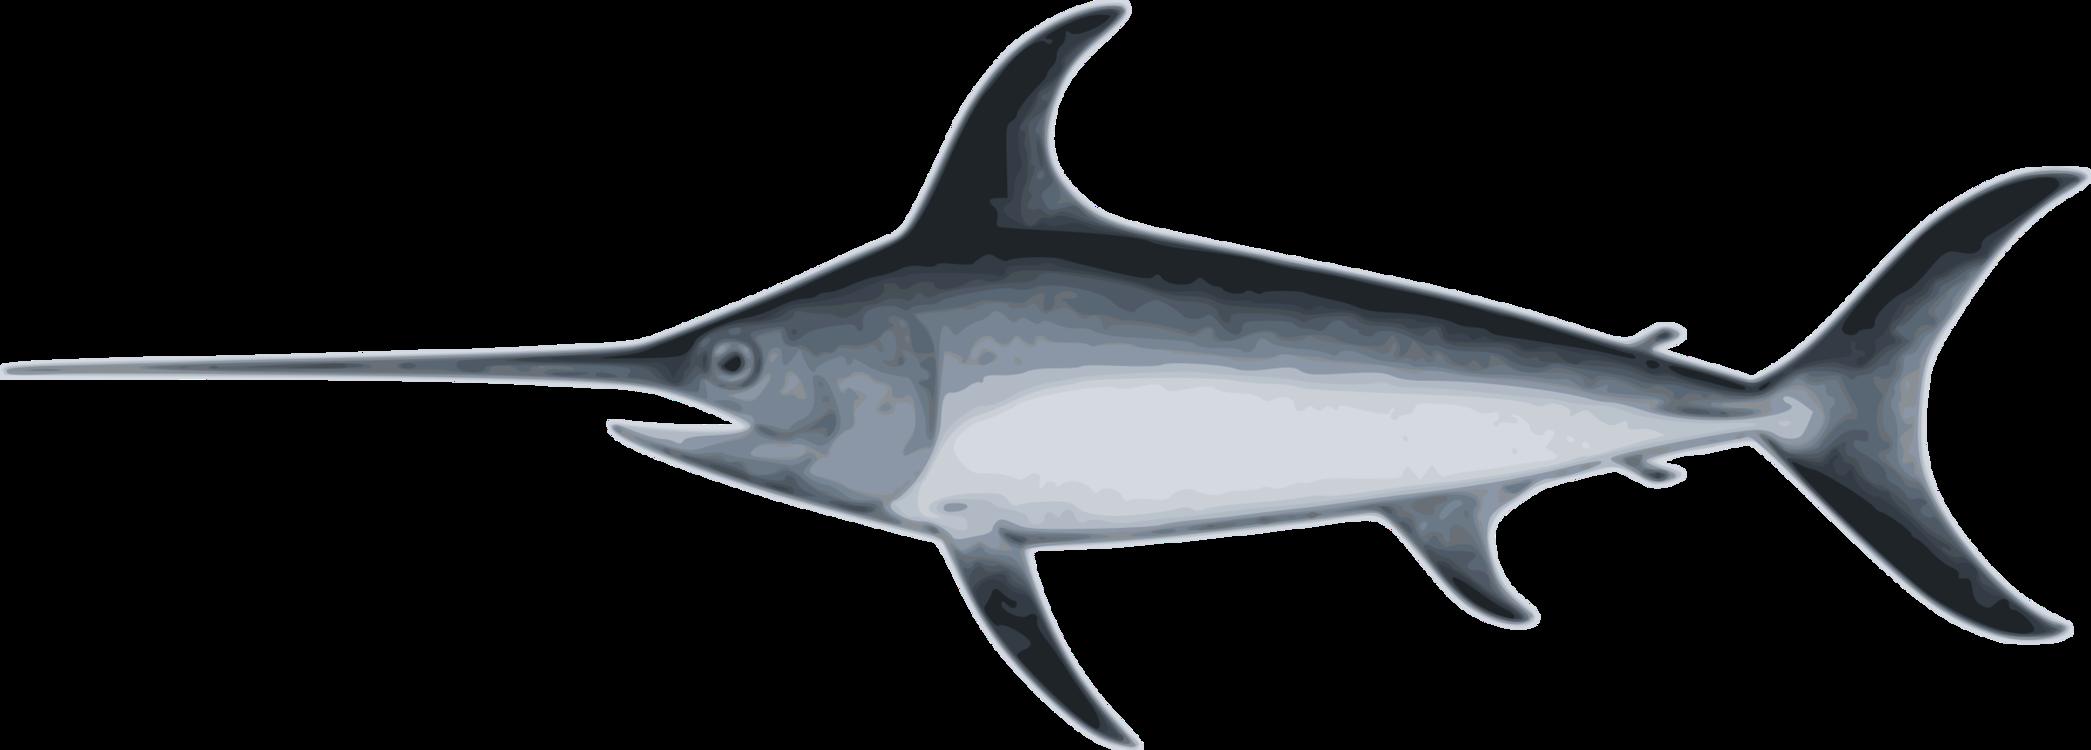 Marine Biology,Shark,Billfish